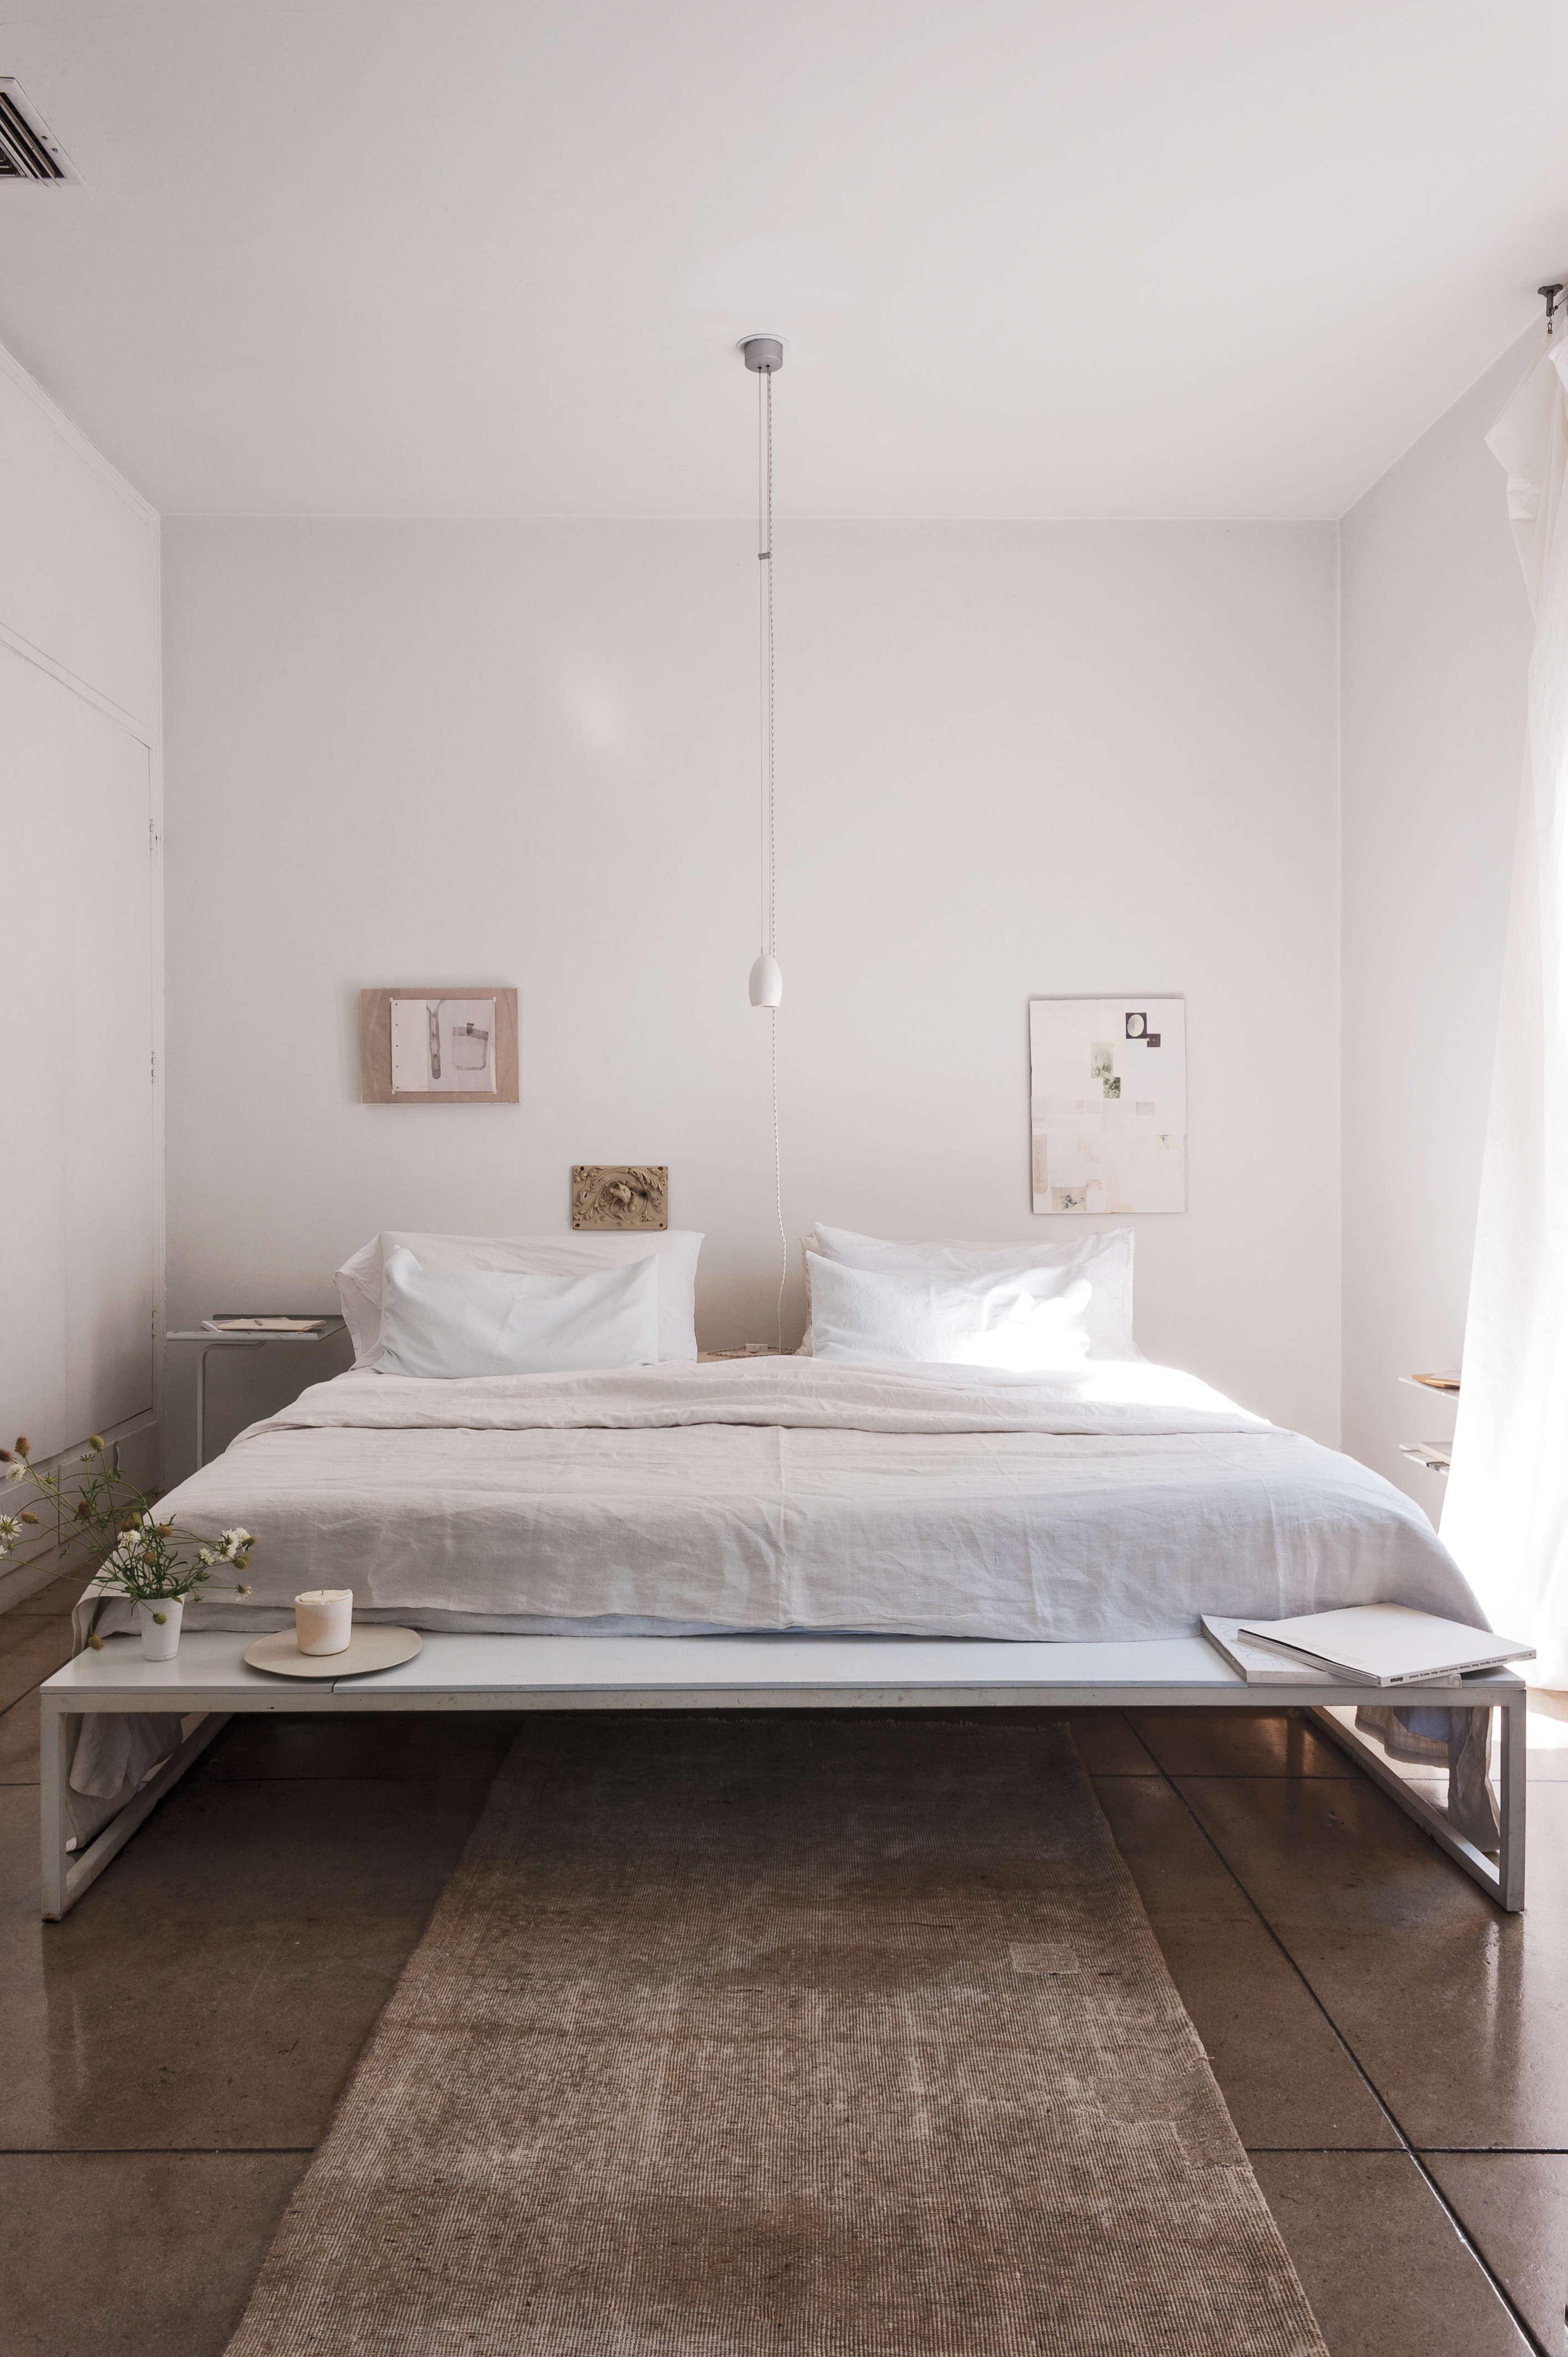 designer michaela scherrer&#8\2\17;s bed feels spacious even though the bed 11